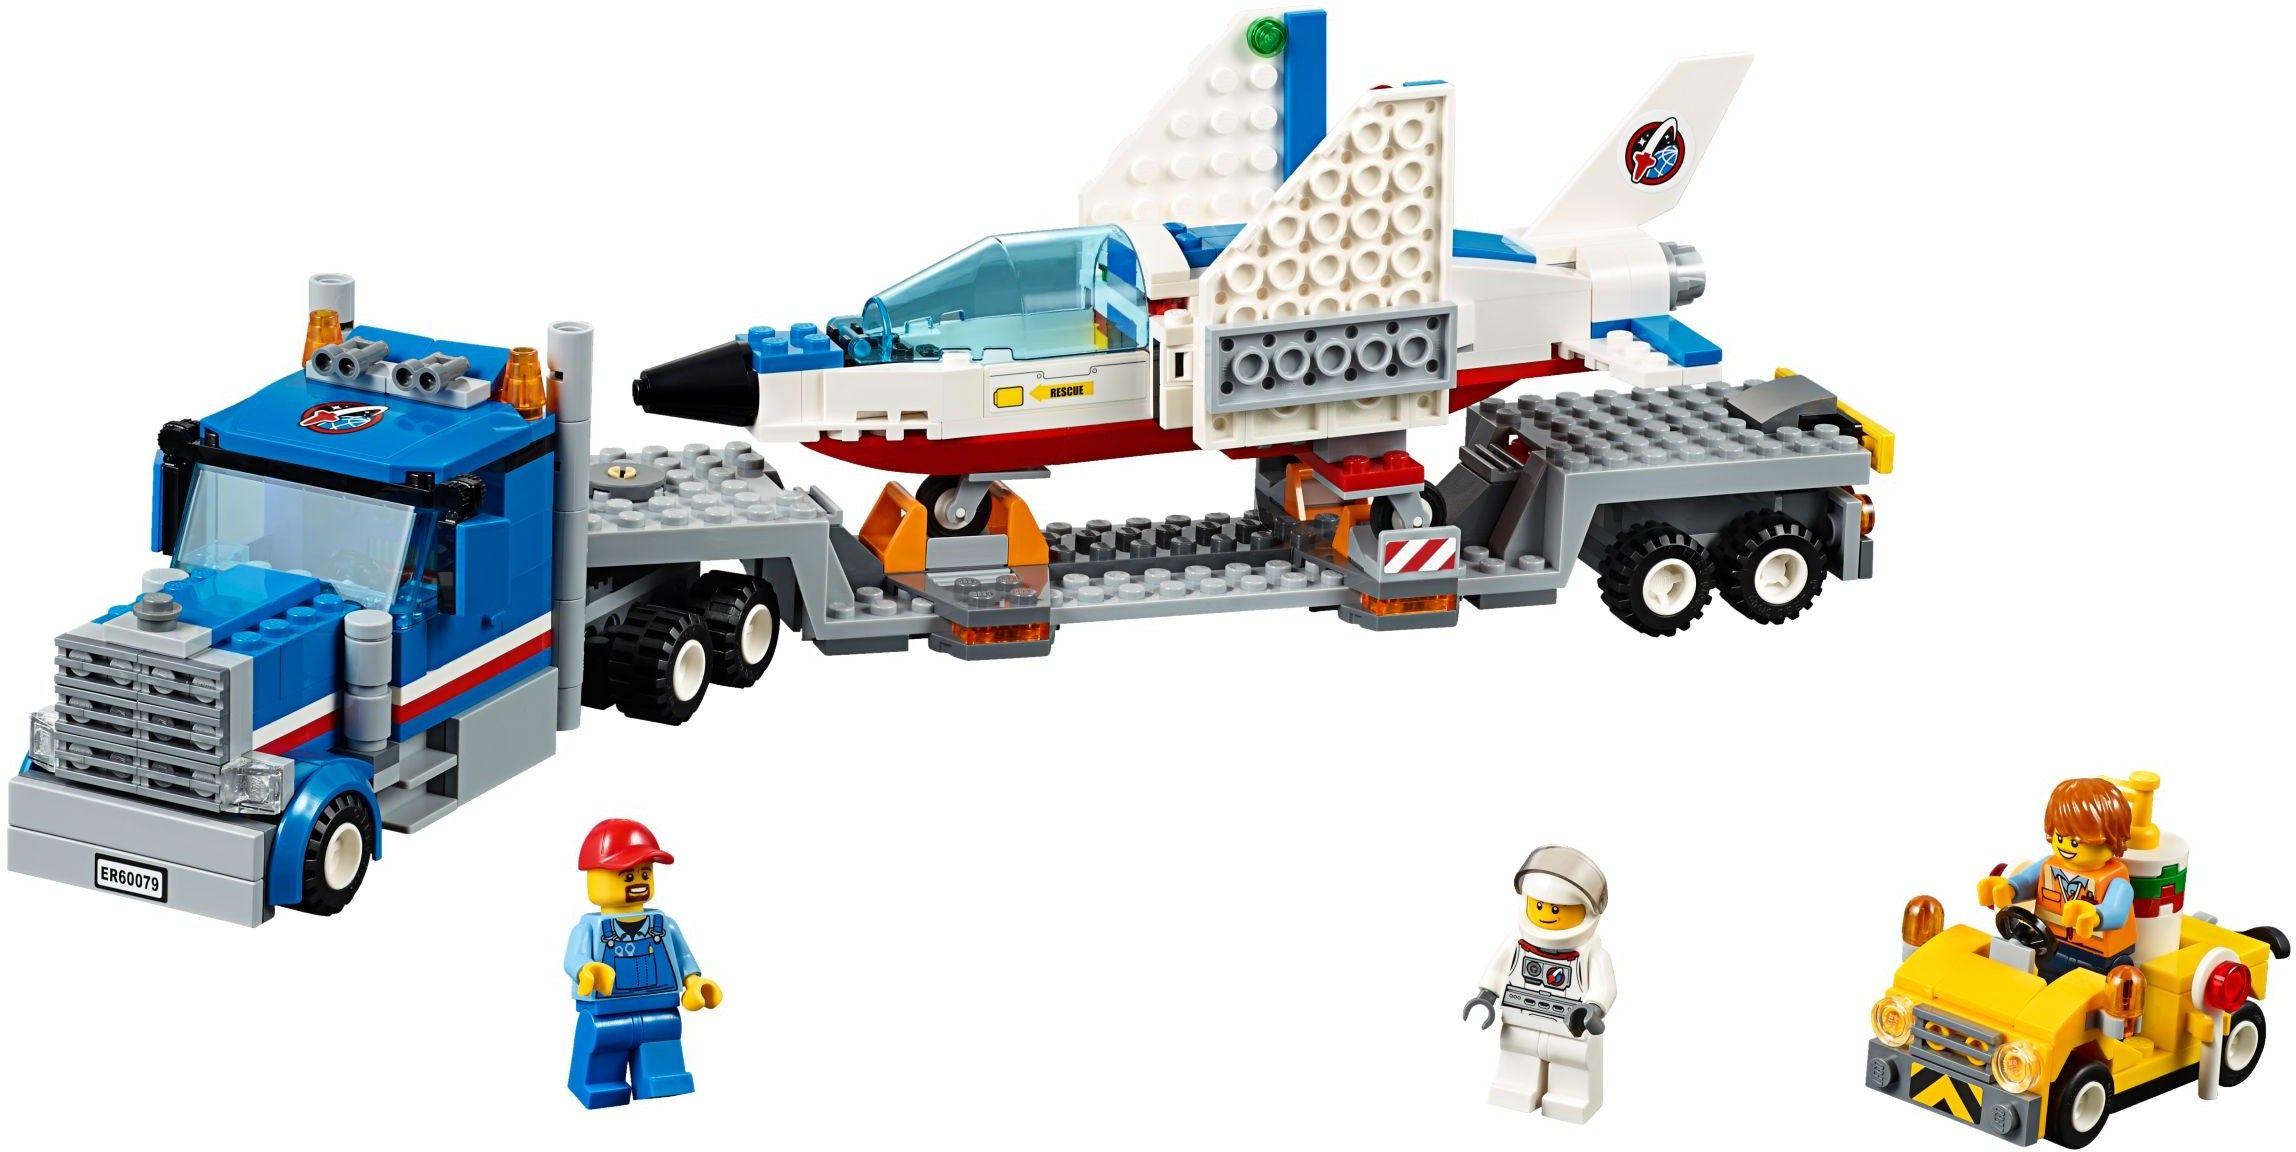 60079 1 Training Jet Transporter In 2020 Lego City Lego City Space Lego City Sets